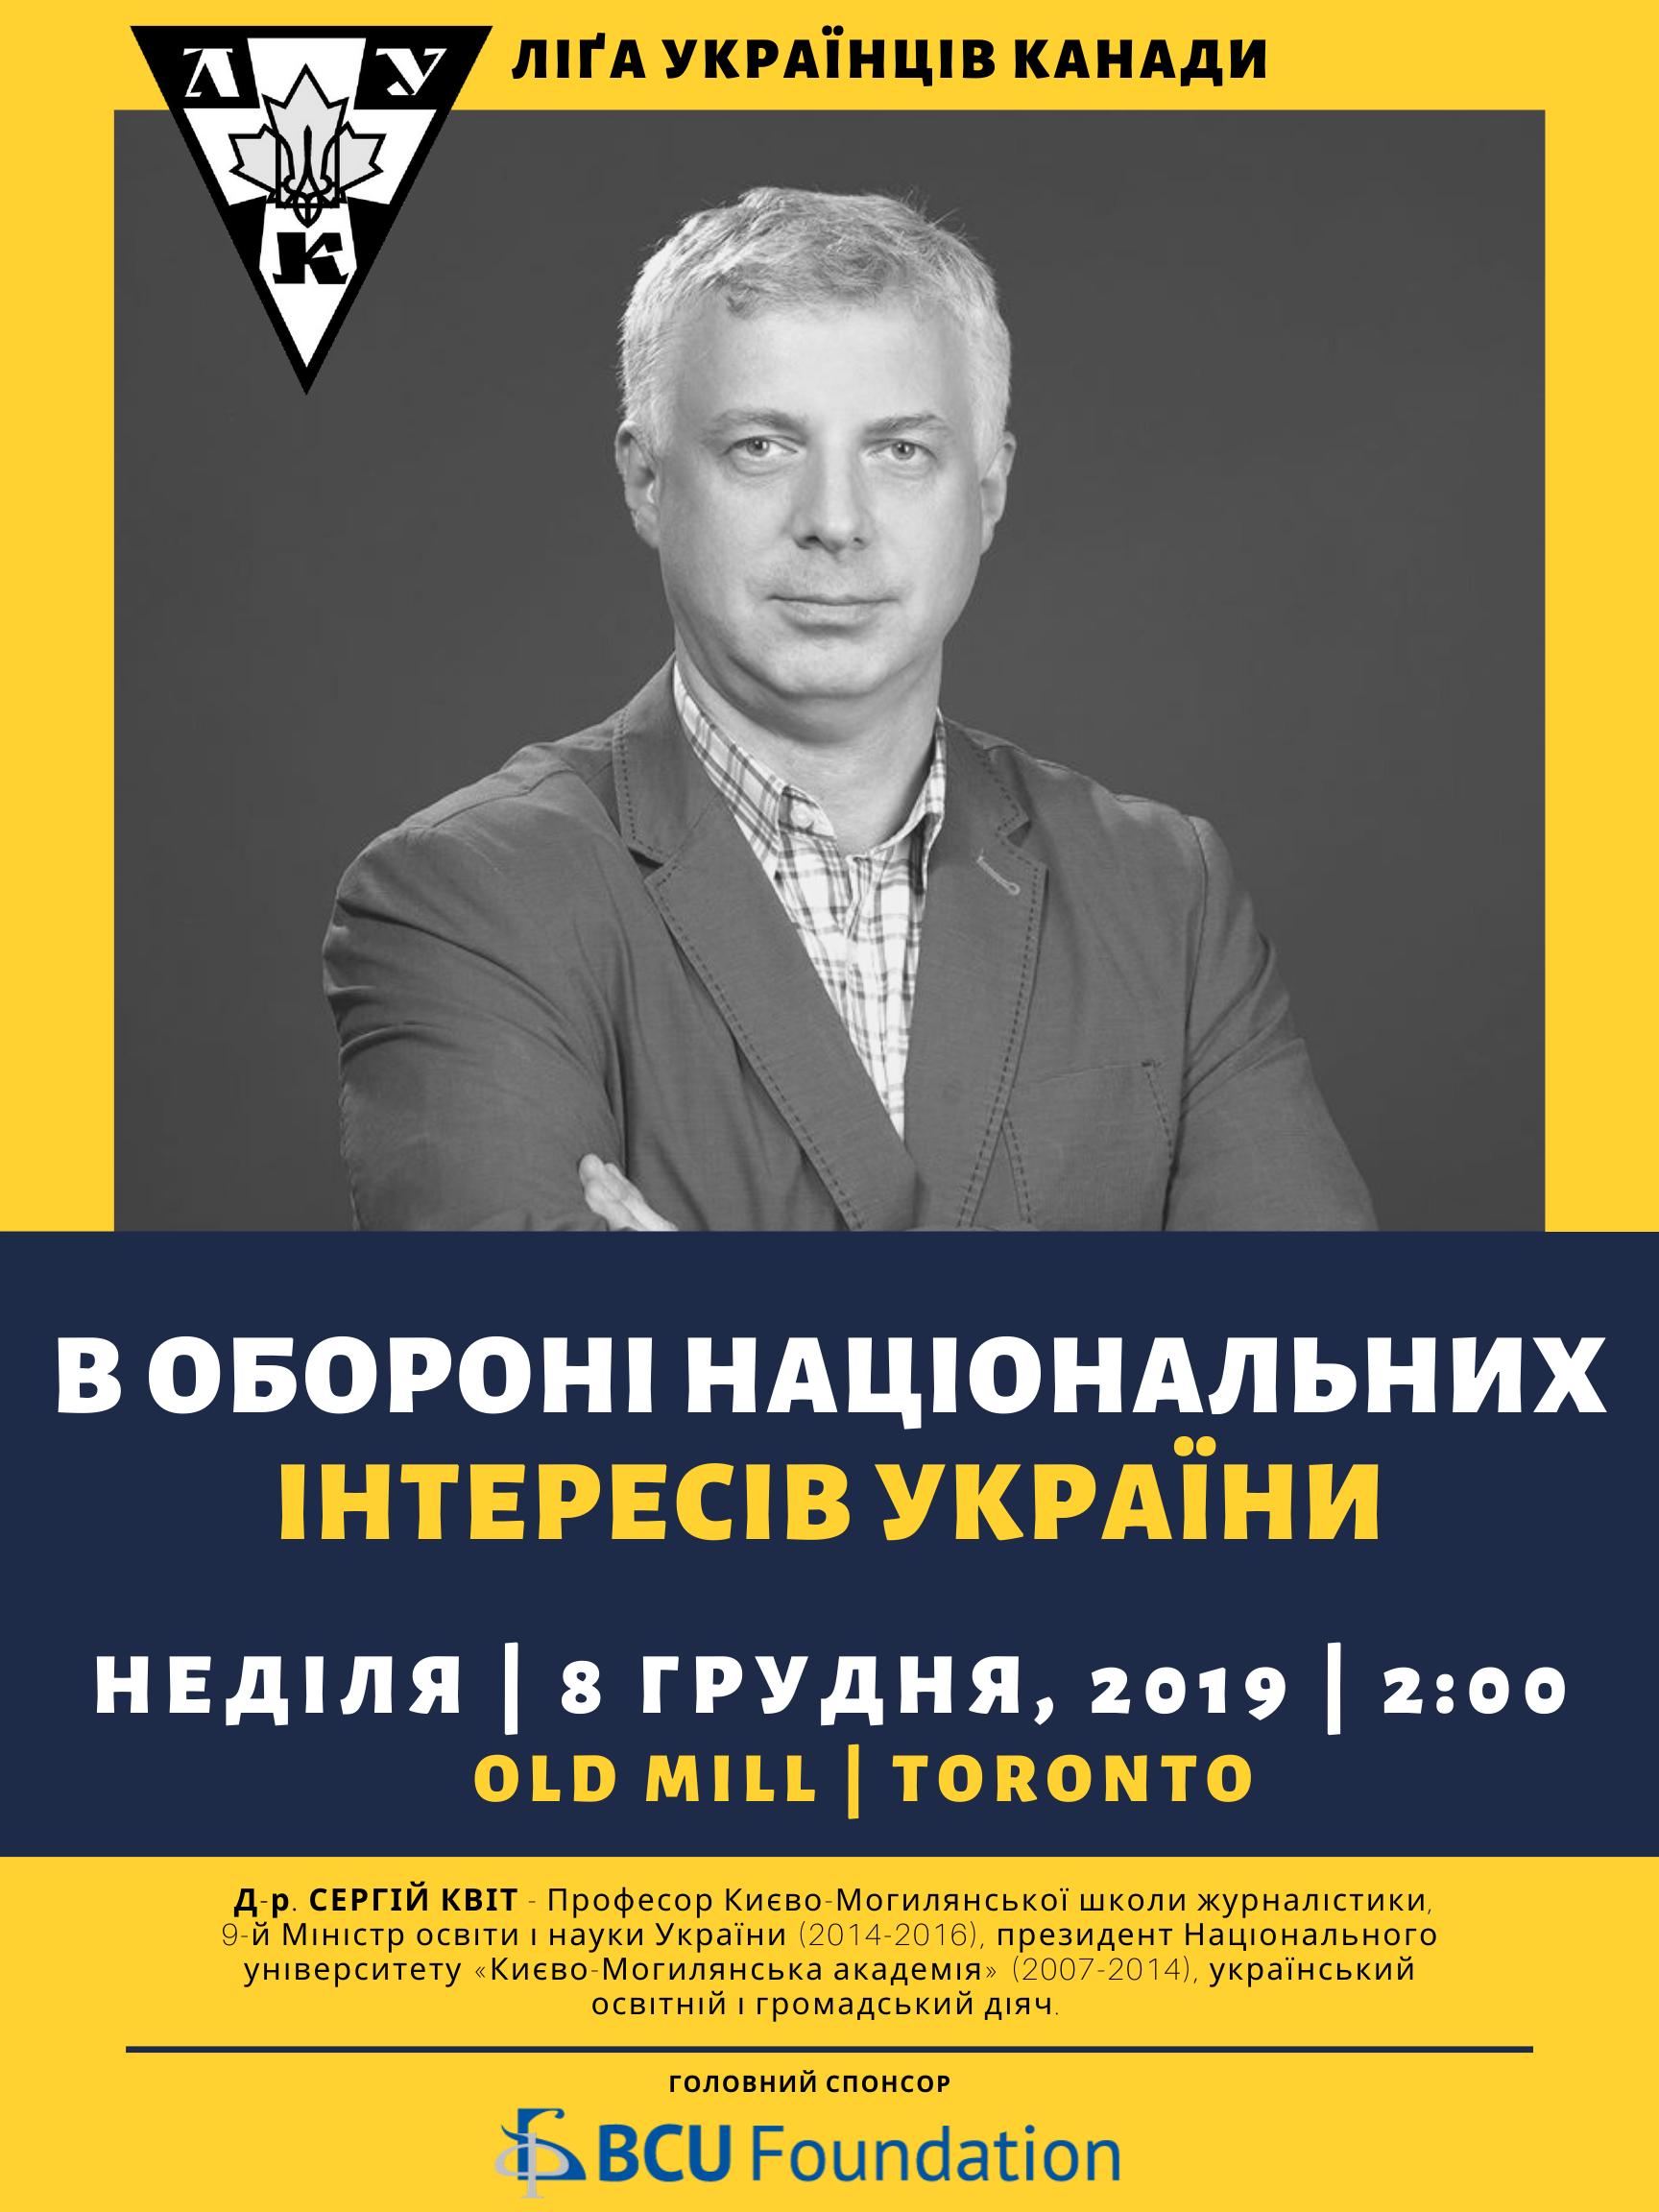 Kvit Lecture in Toronto